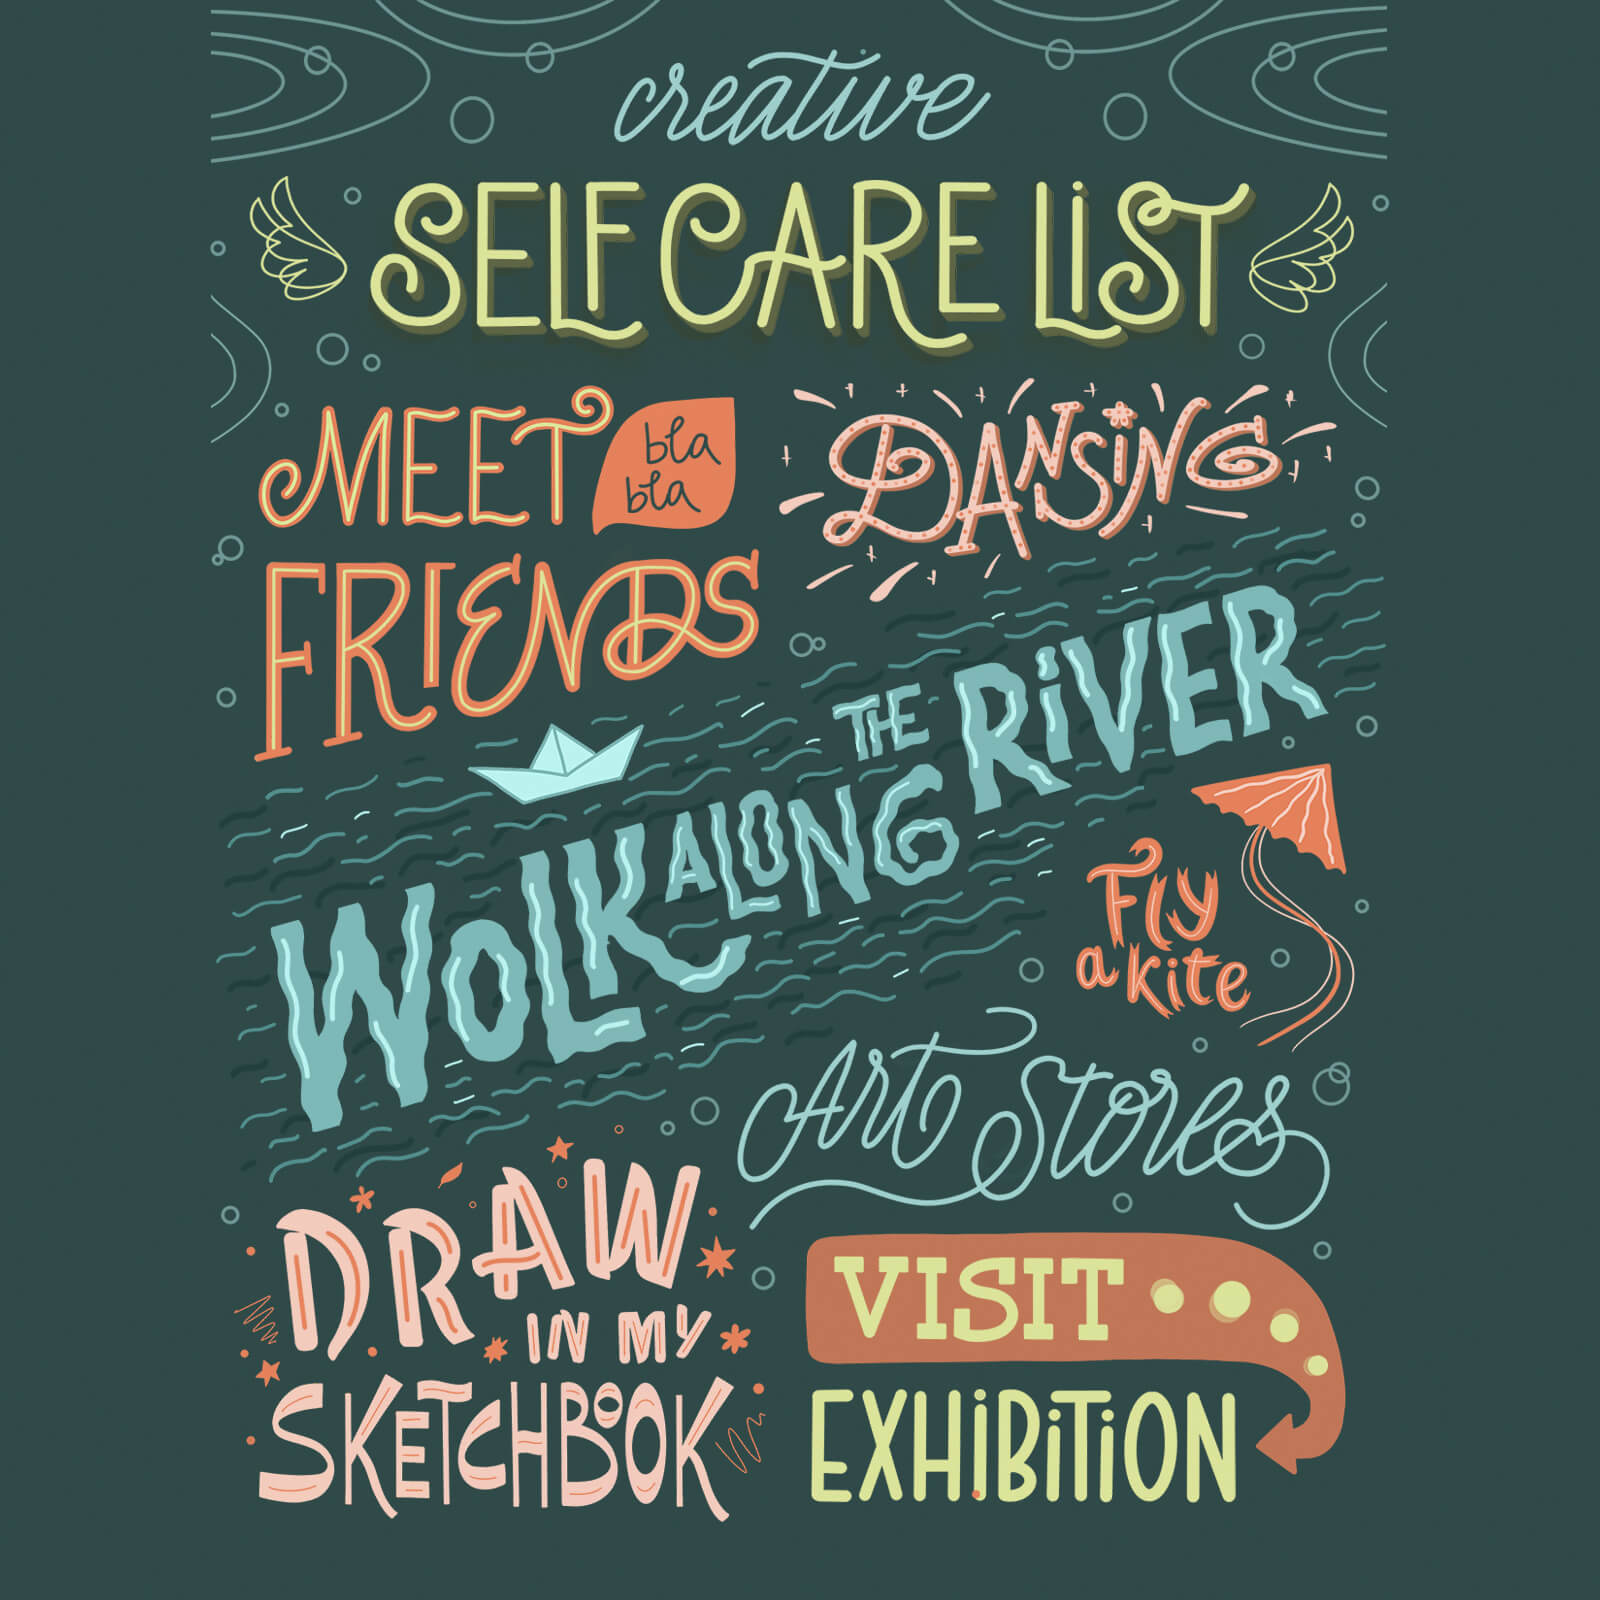 Self Care List - Ekaterina Vasilevskaya